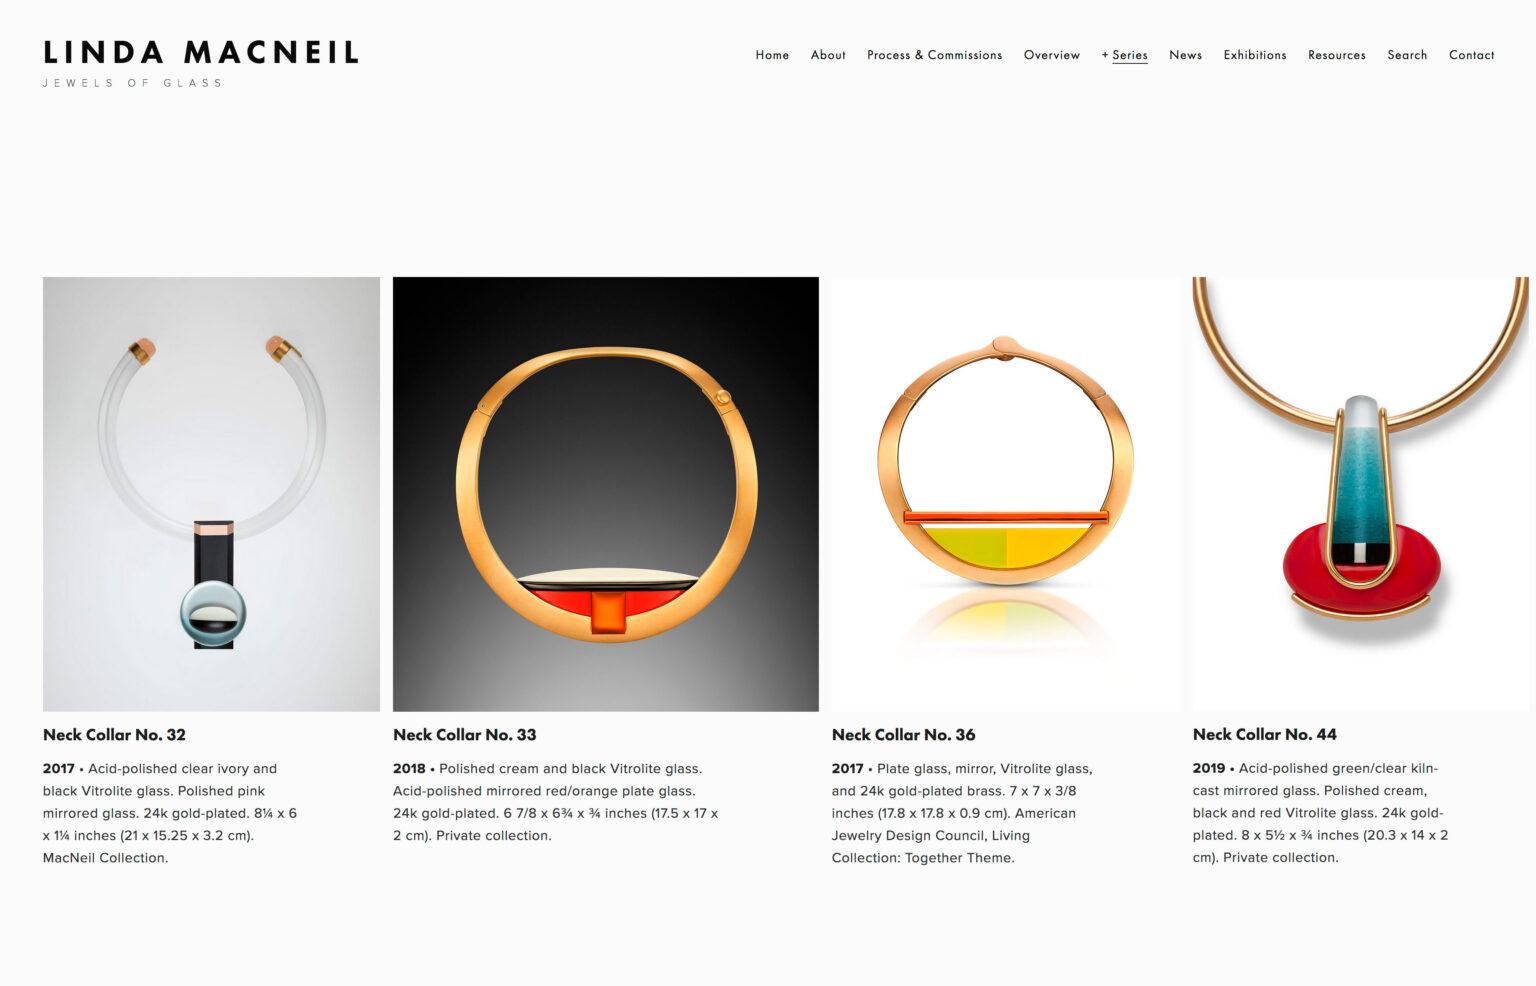 Linda MacNeil Jewels of Glass website design